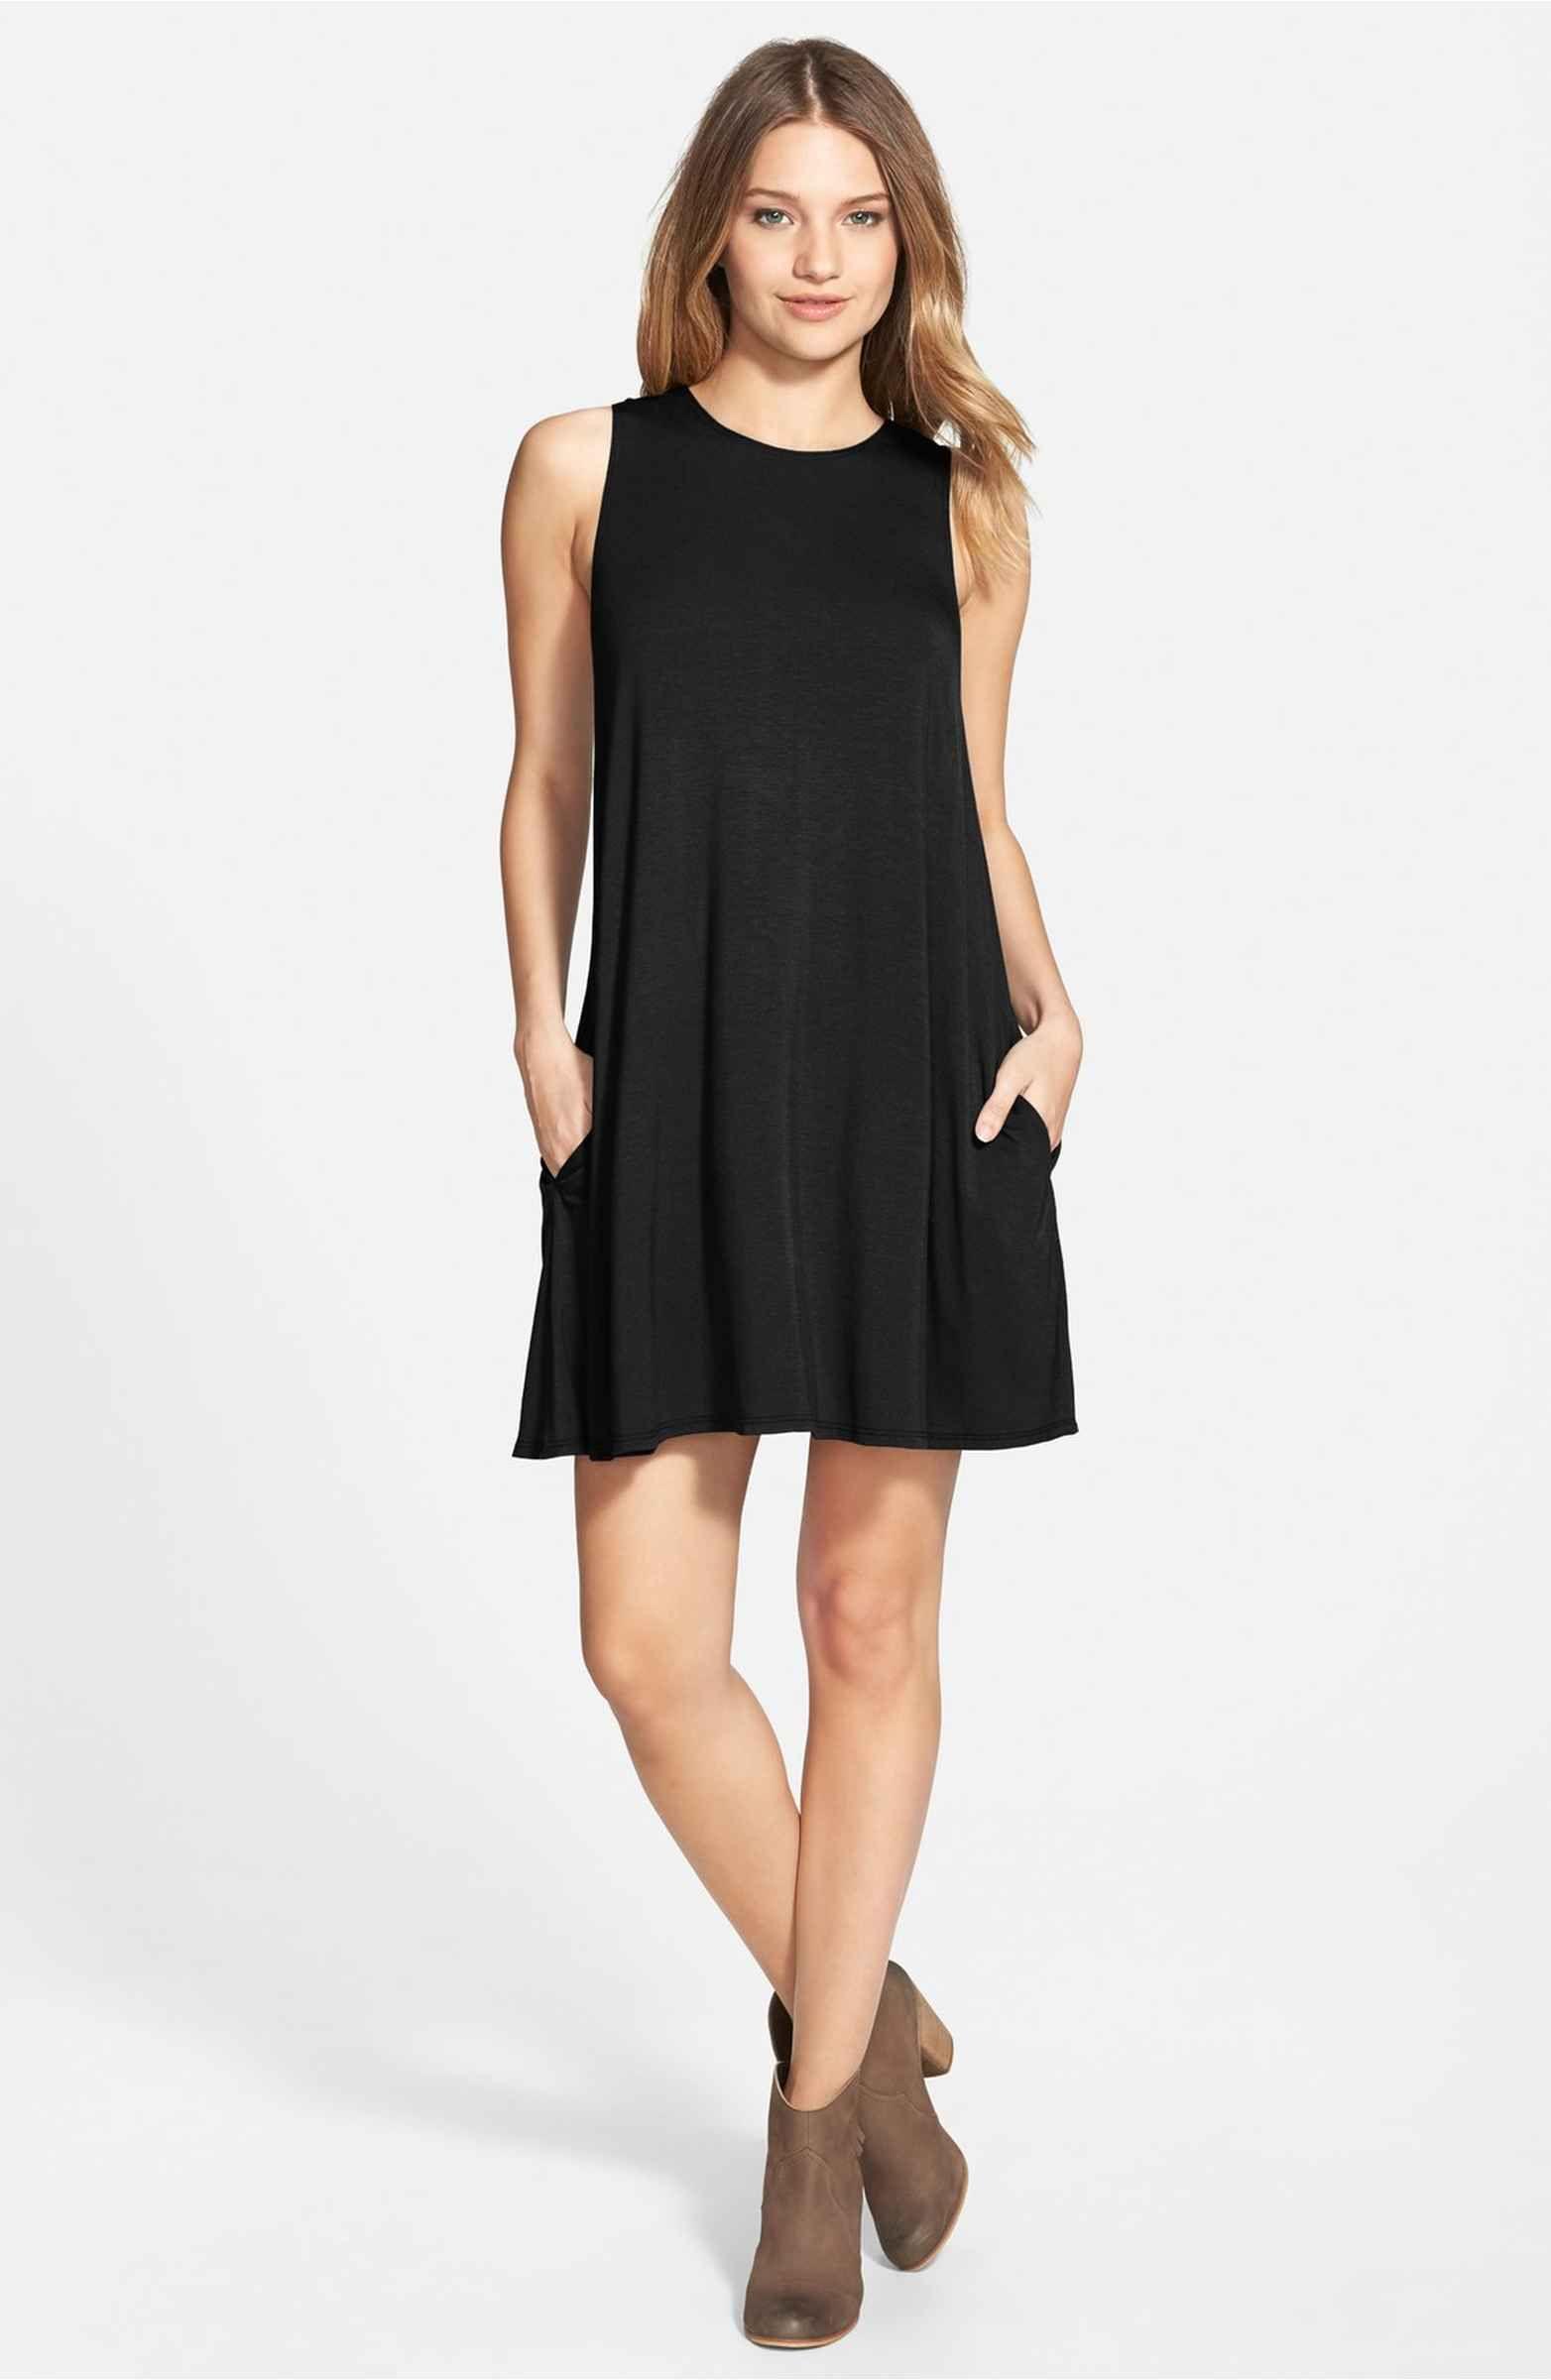 Main image socialite high neck dress wardrobe pinterest